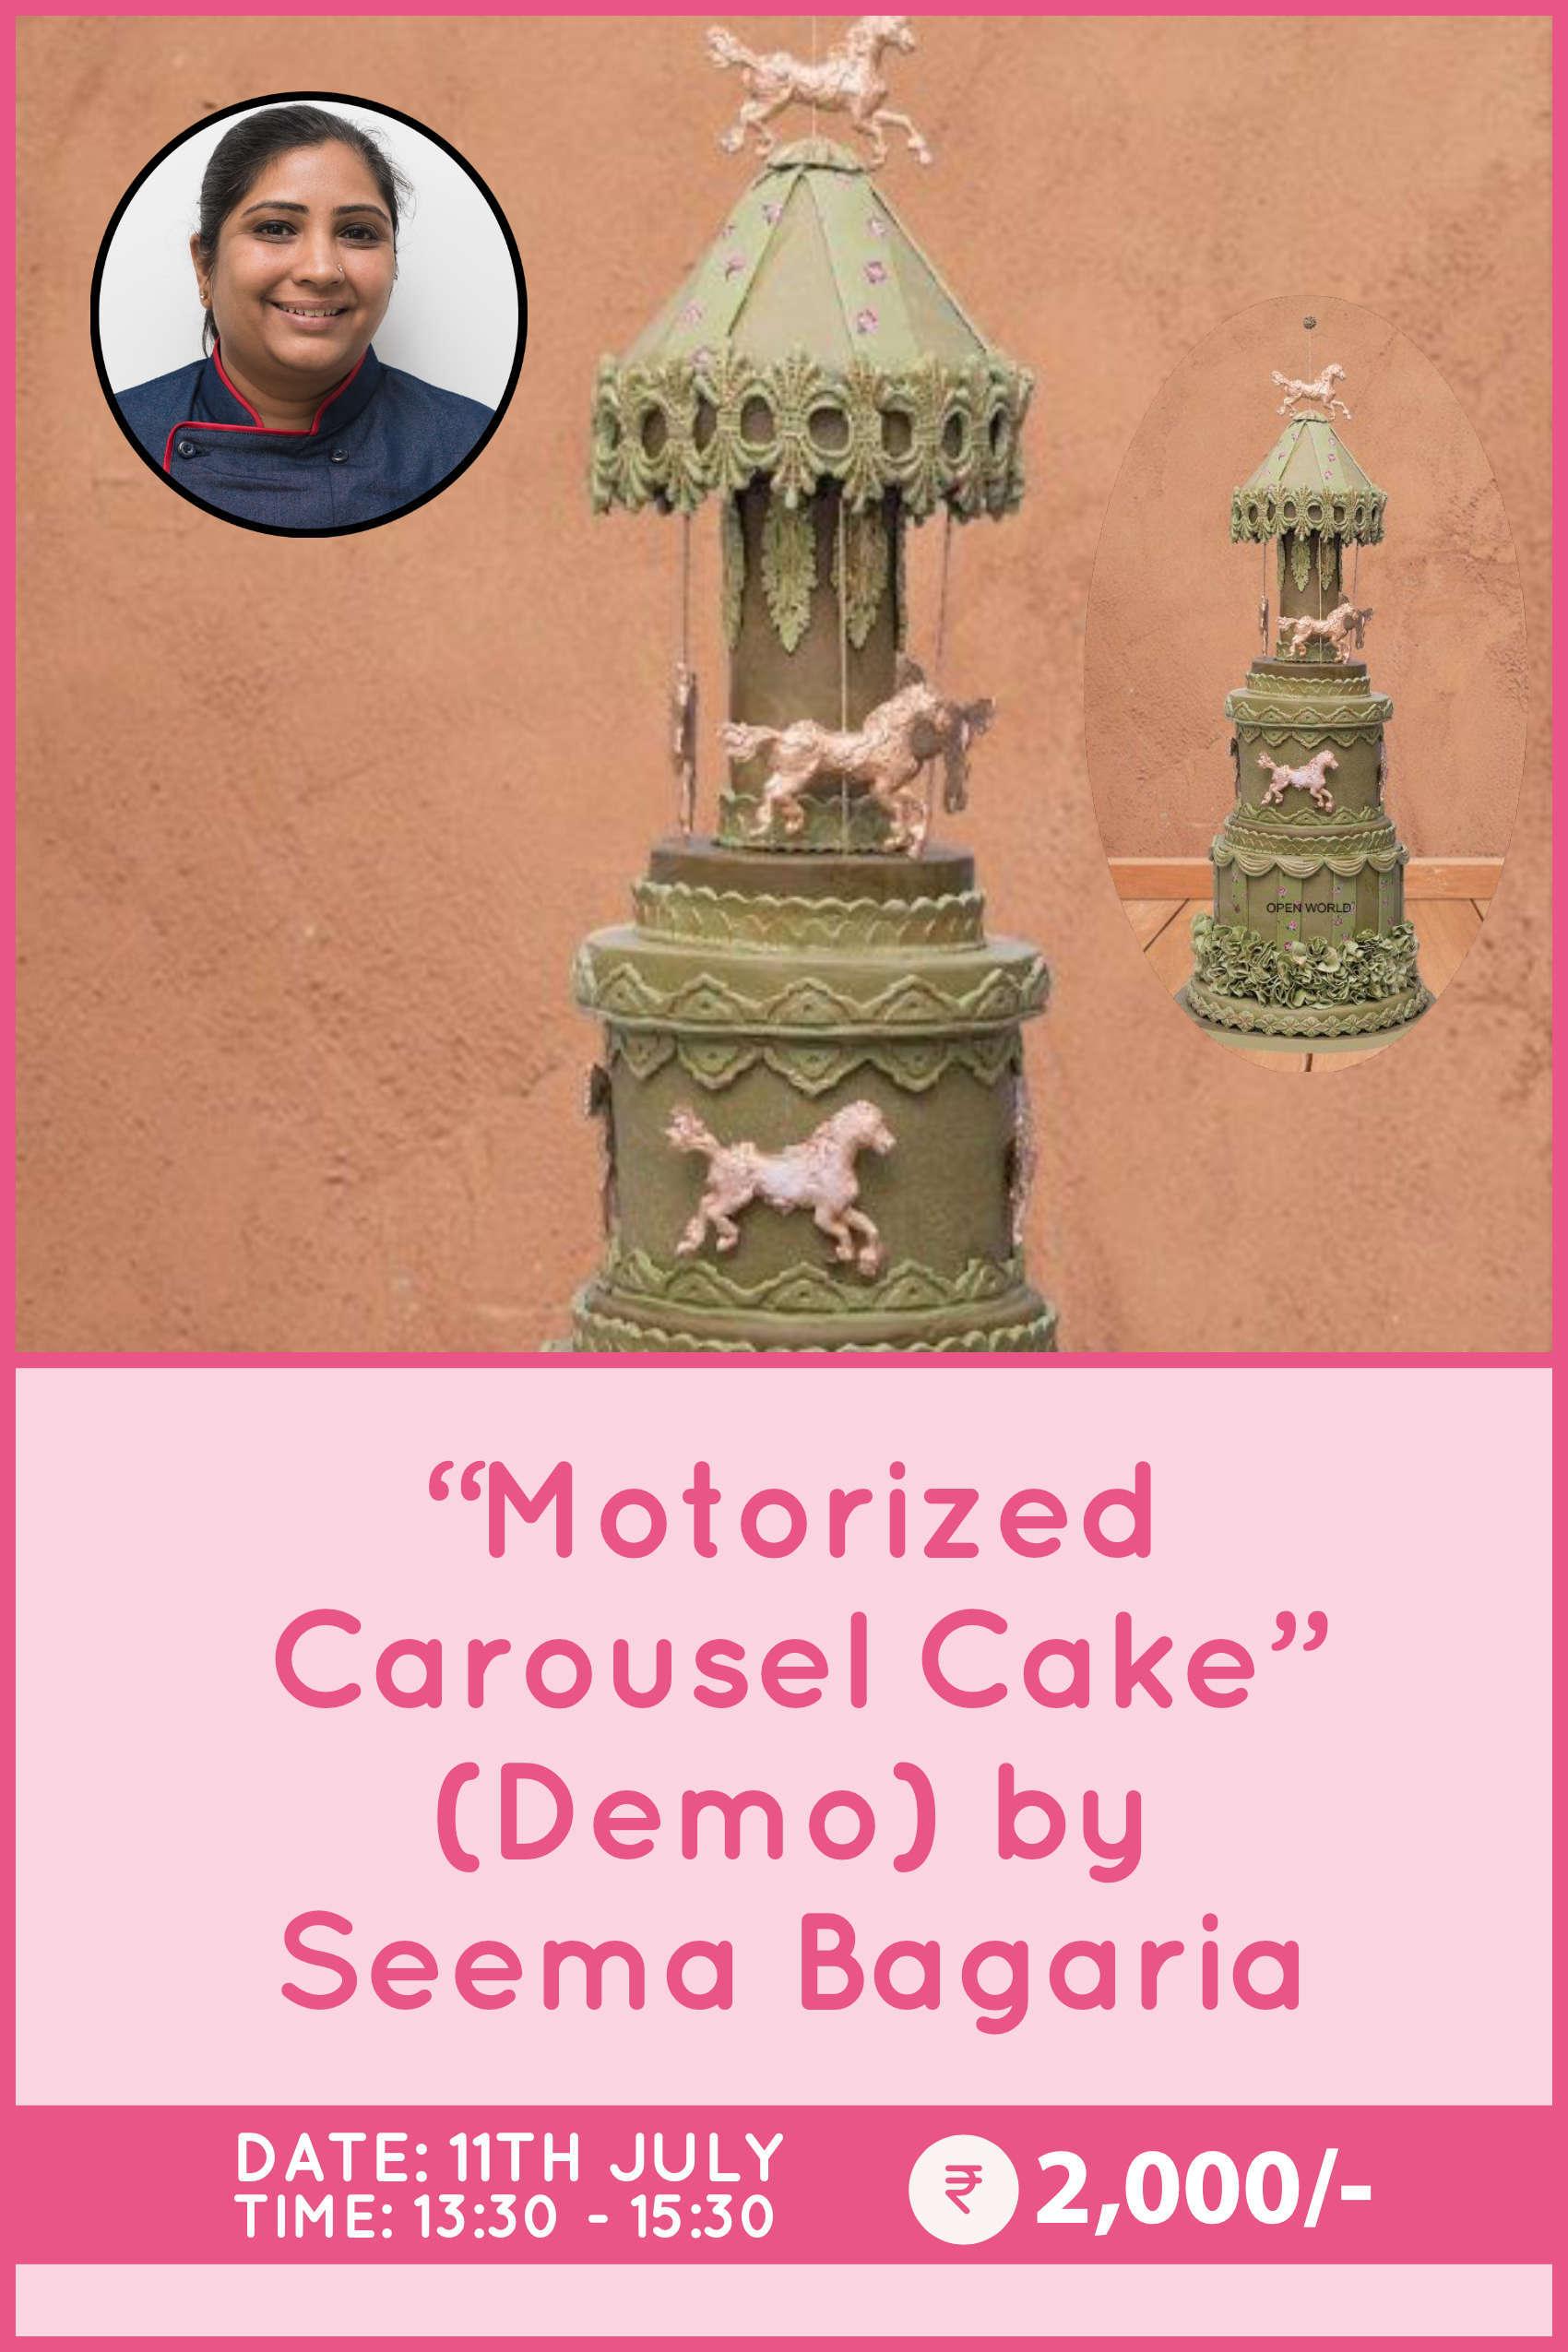 Motorised Carousel Cake by Seema Bagaria